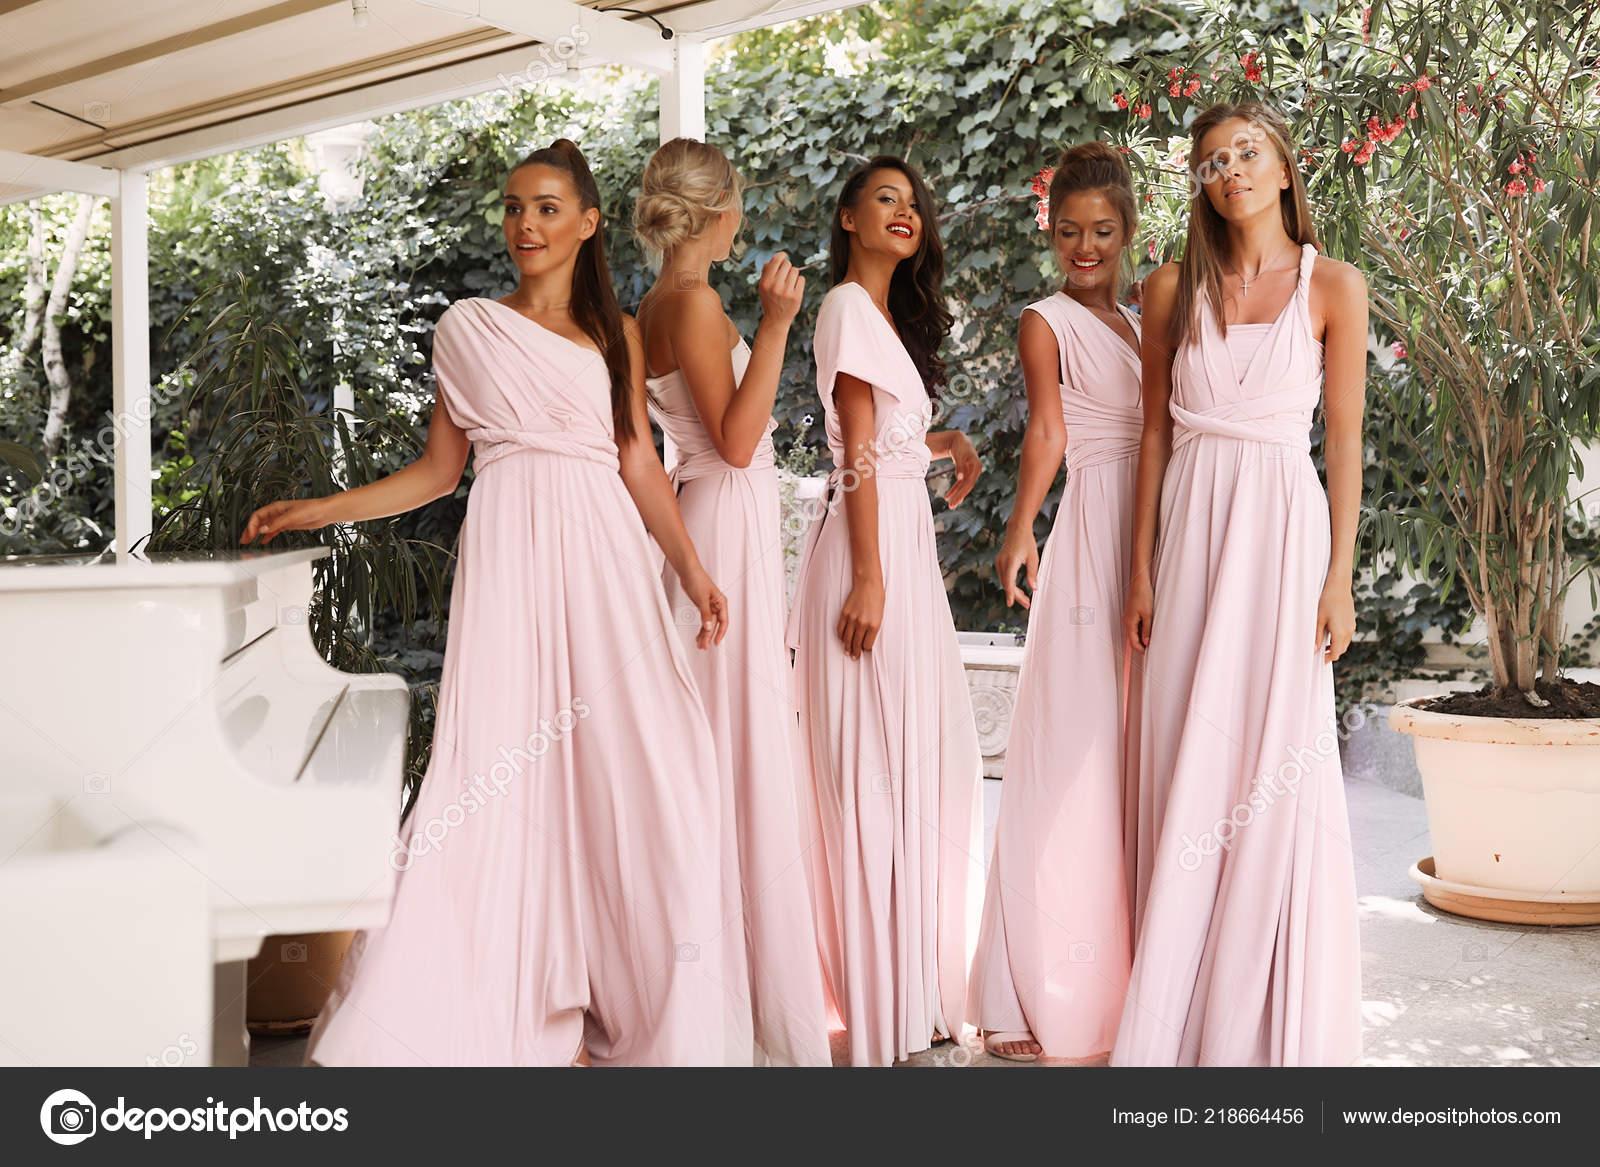 9fb4abca4645 Κορίτσια Silph Ελαφρύ Ροζ Φορέματα Στέκεται Κοντά Πιάνο Βεράντα Εστιατόριο–  εικόνα αρχείου